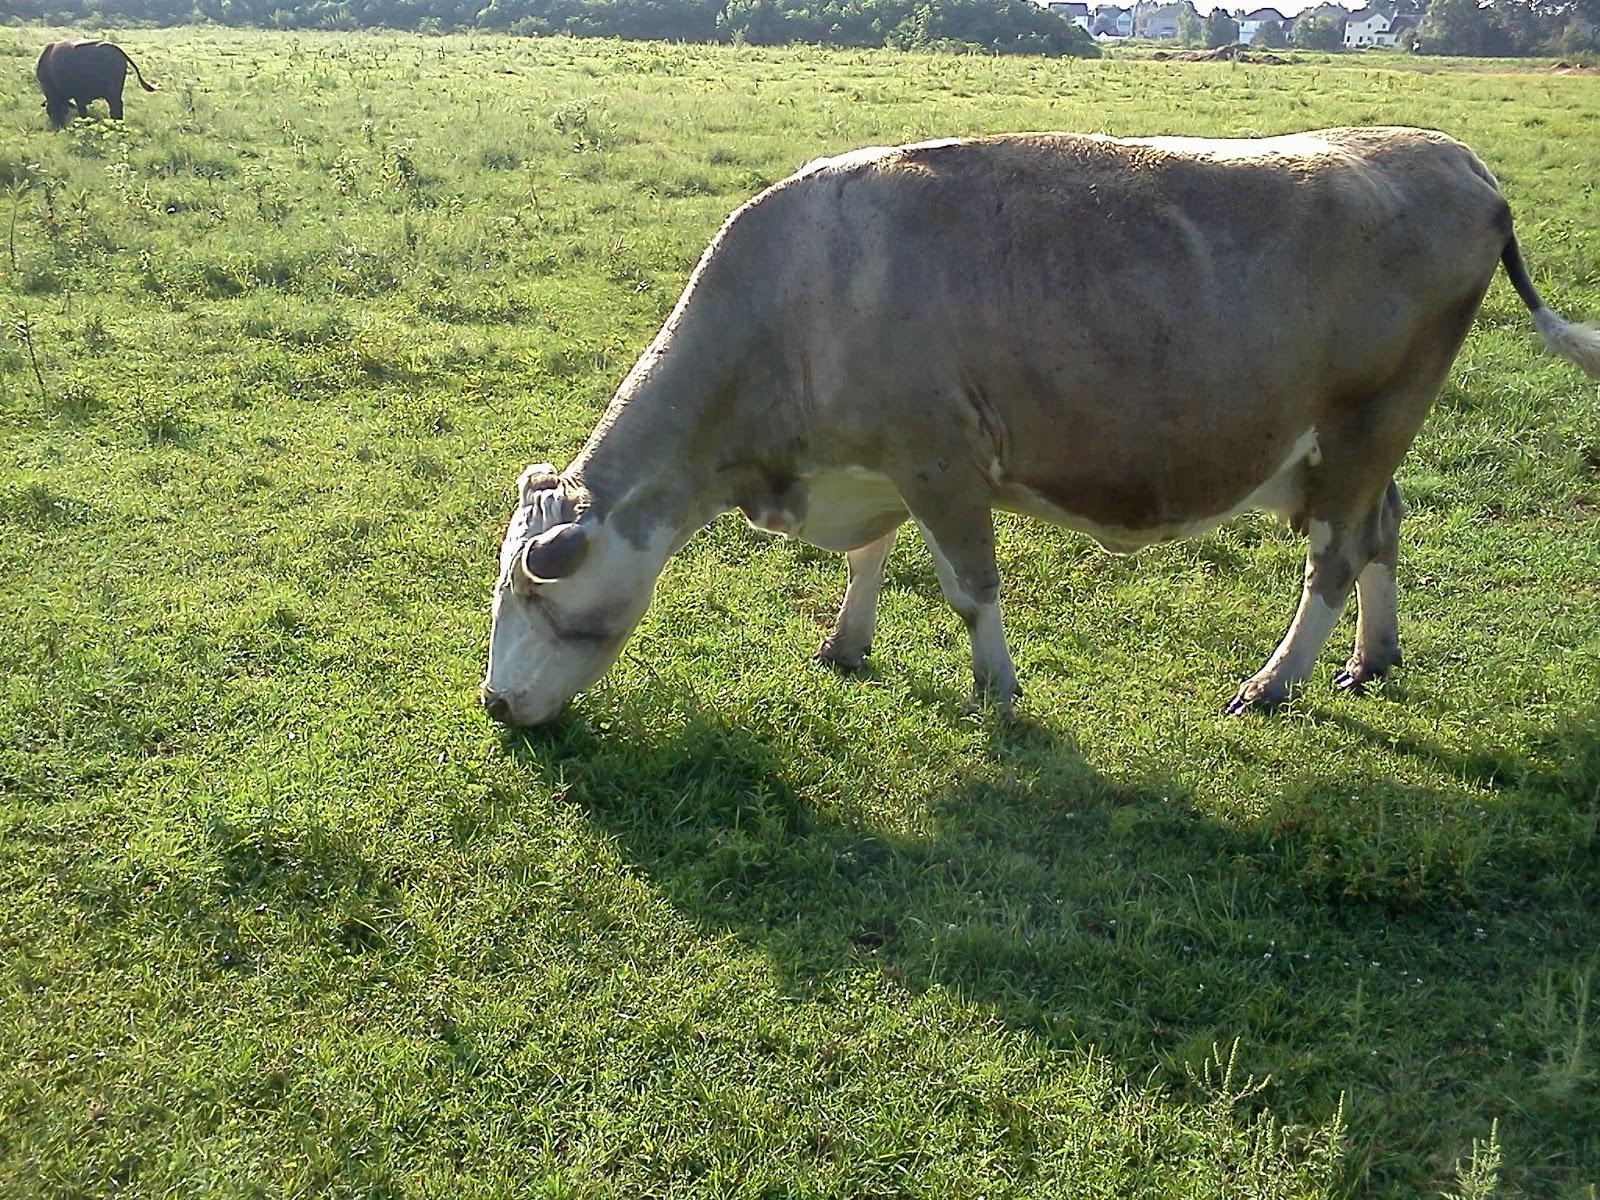 Cow, Constantine Farm, near the Crossings Park, Colonie, NY